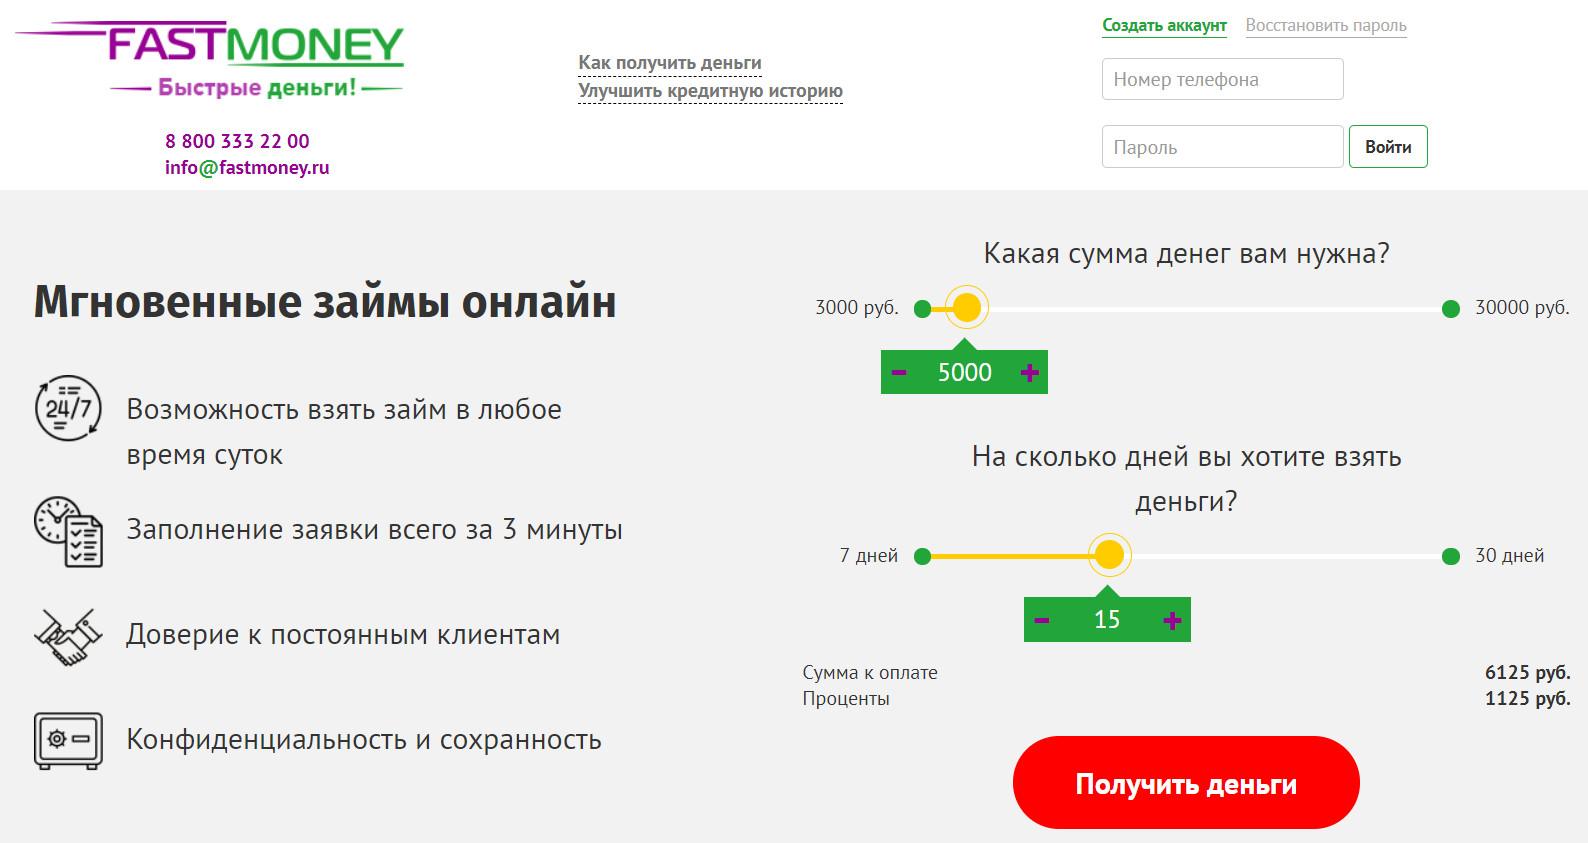 быстрые деньги займ онлайн заявка